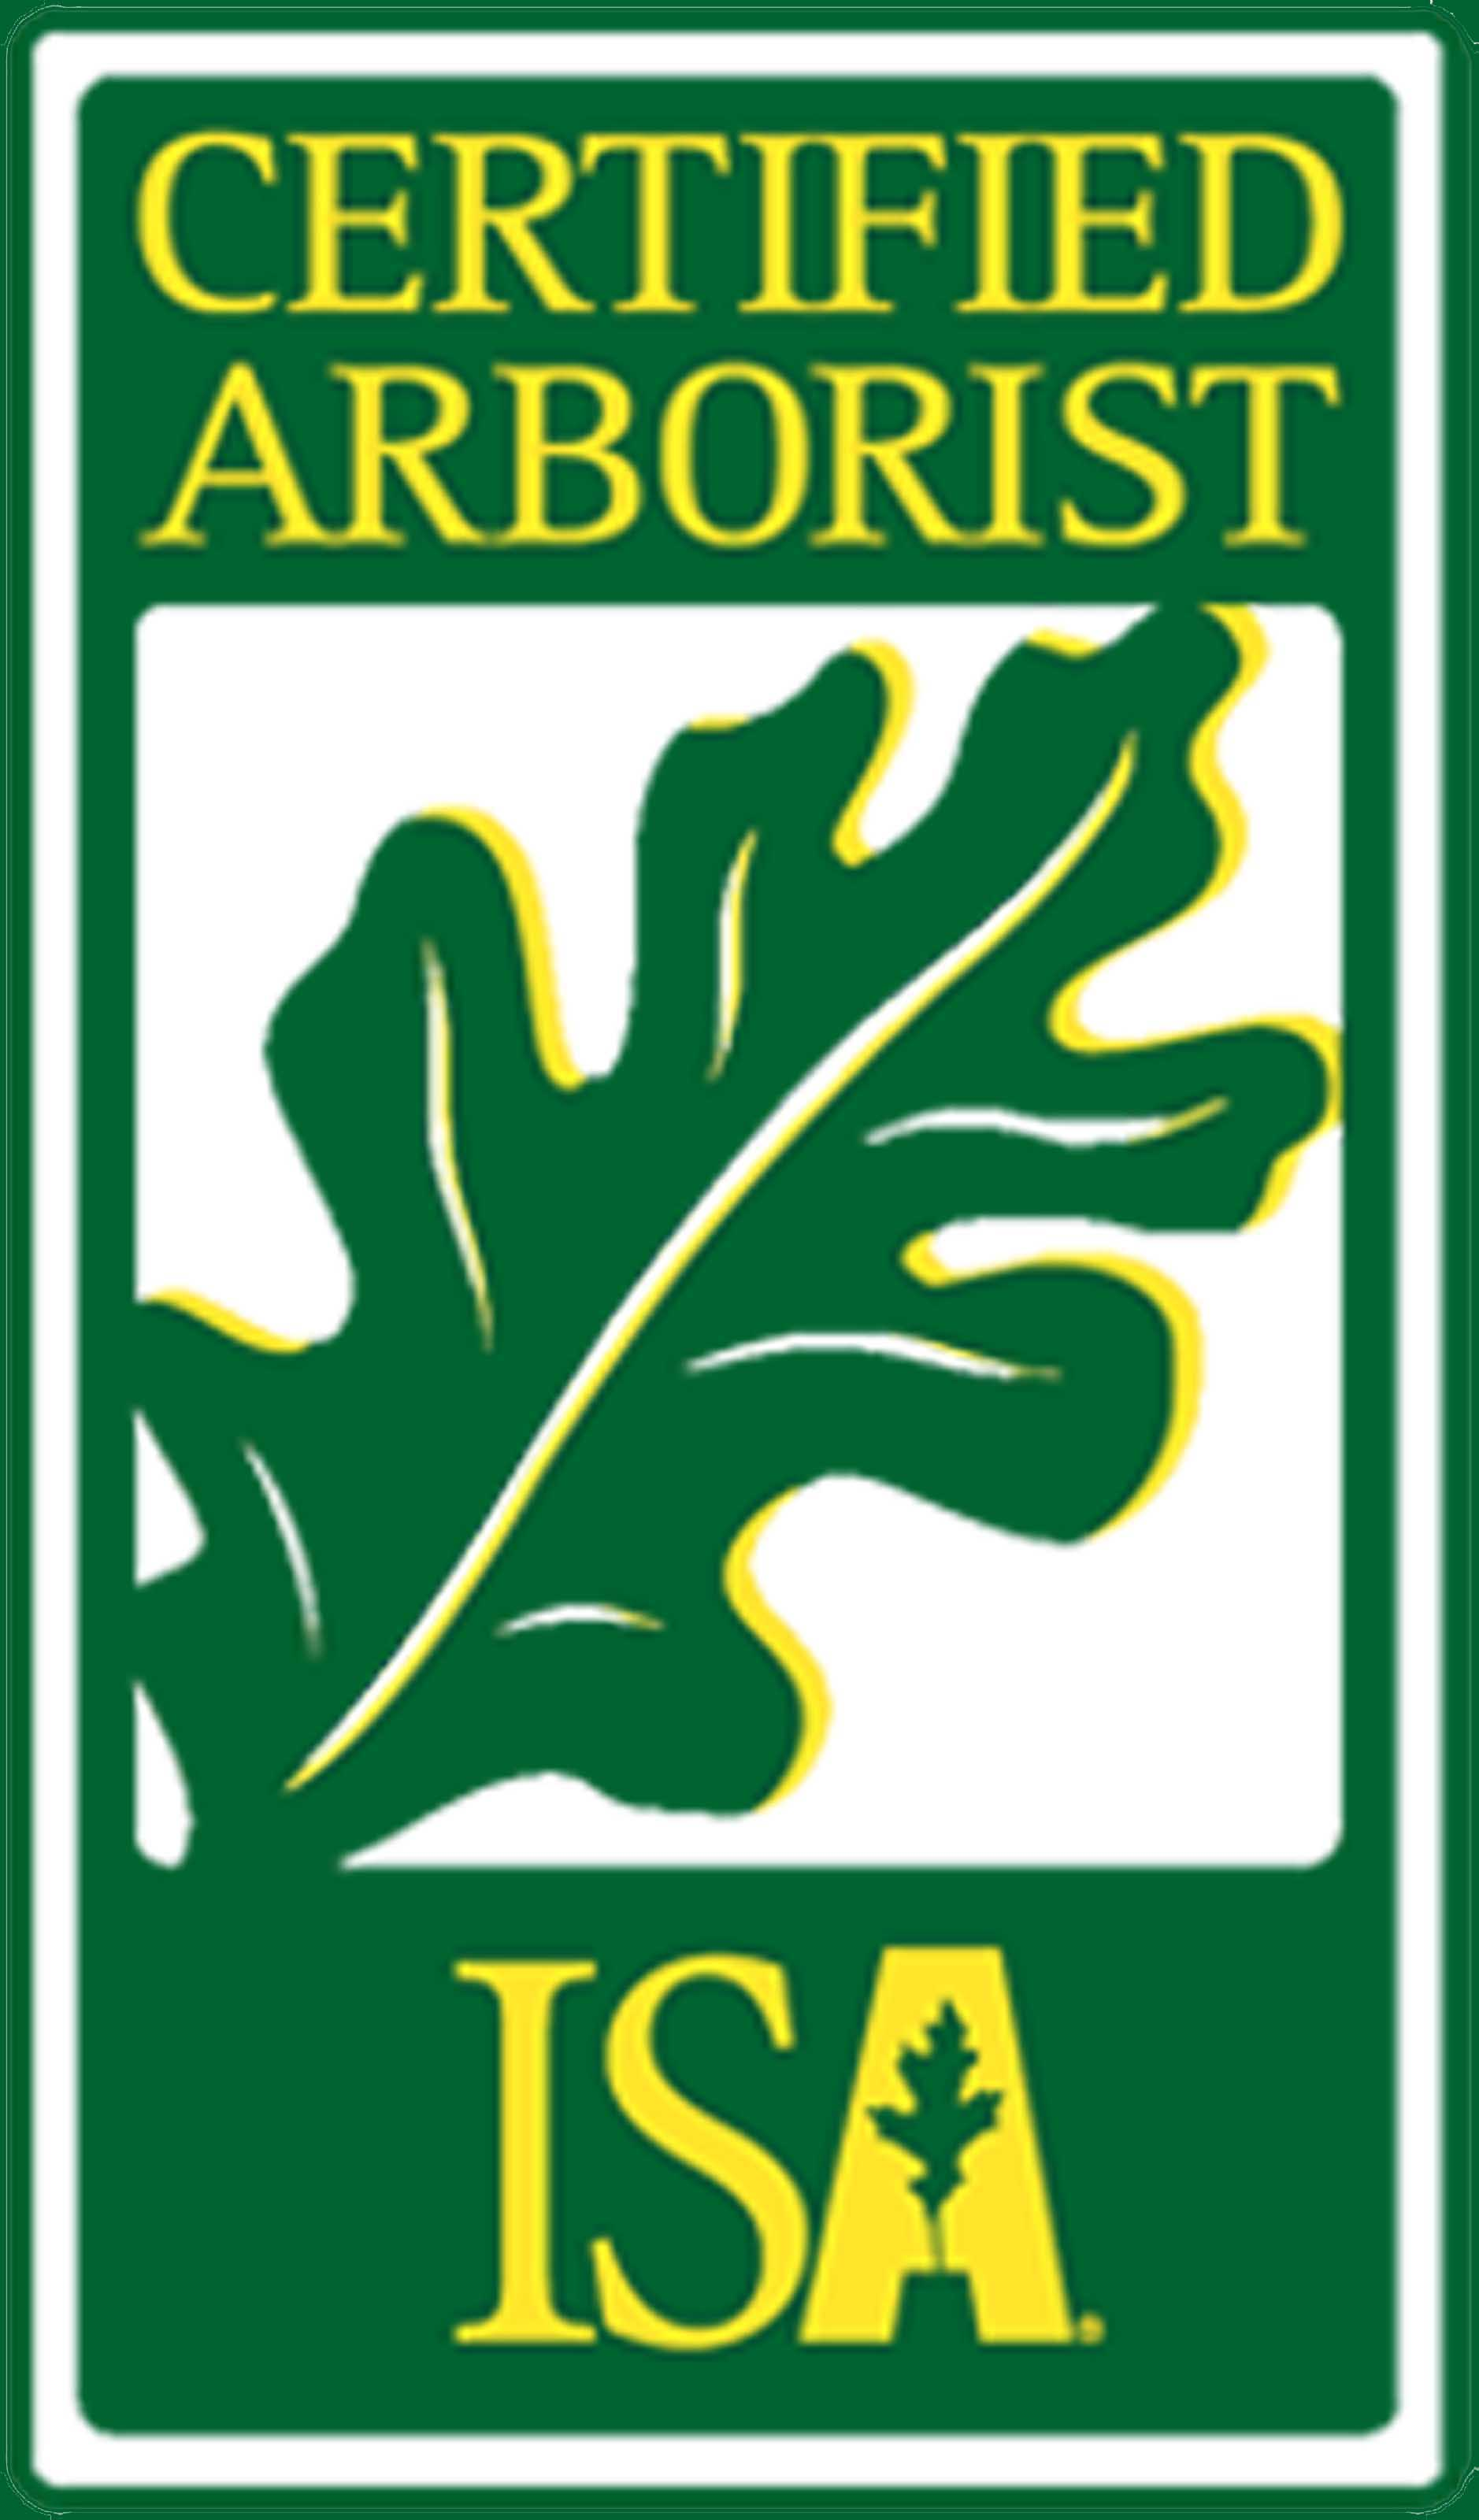 Certified-Arborist-Logo.jpg